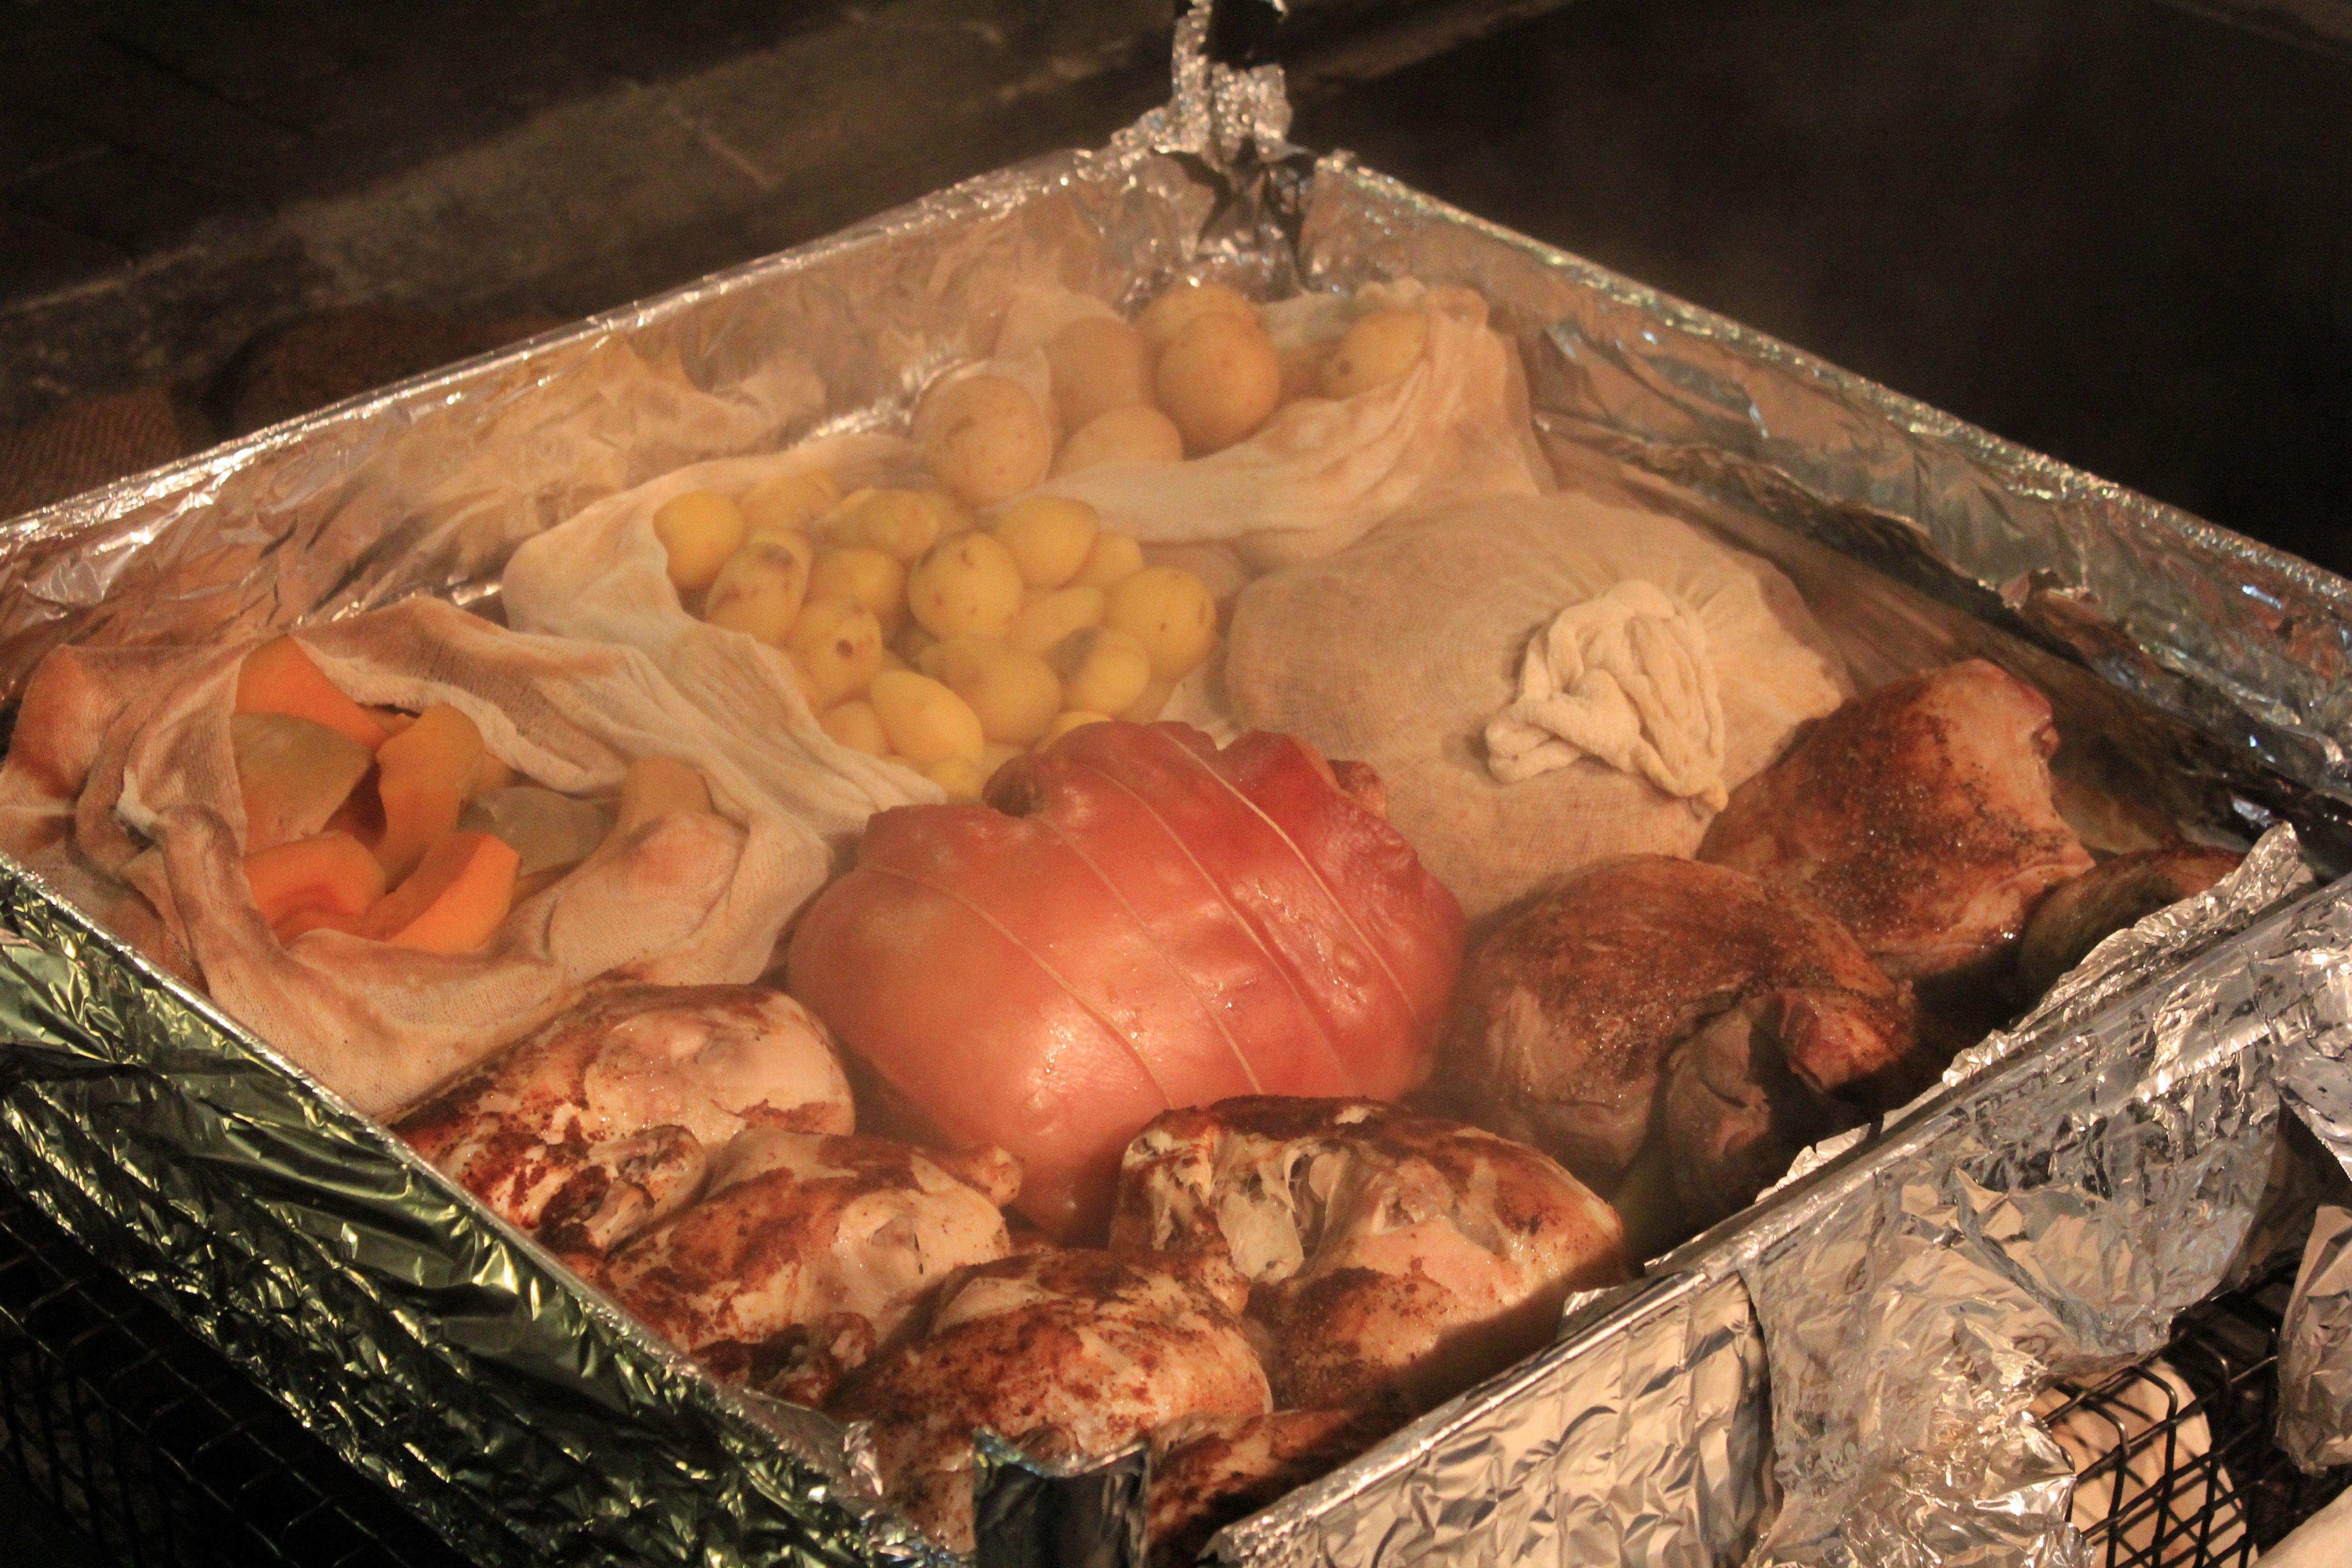 New Zealand Maori Food: New Zealand - Hangi Food